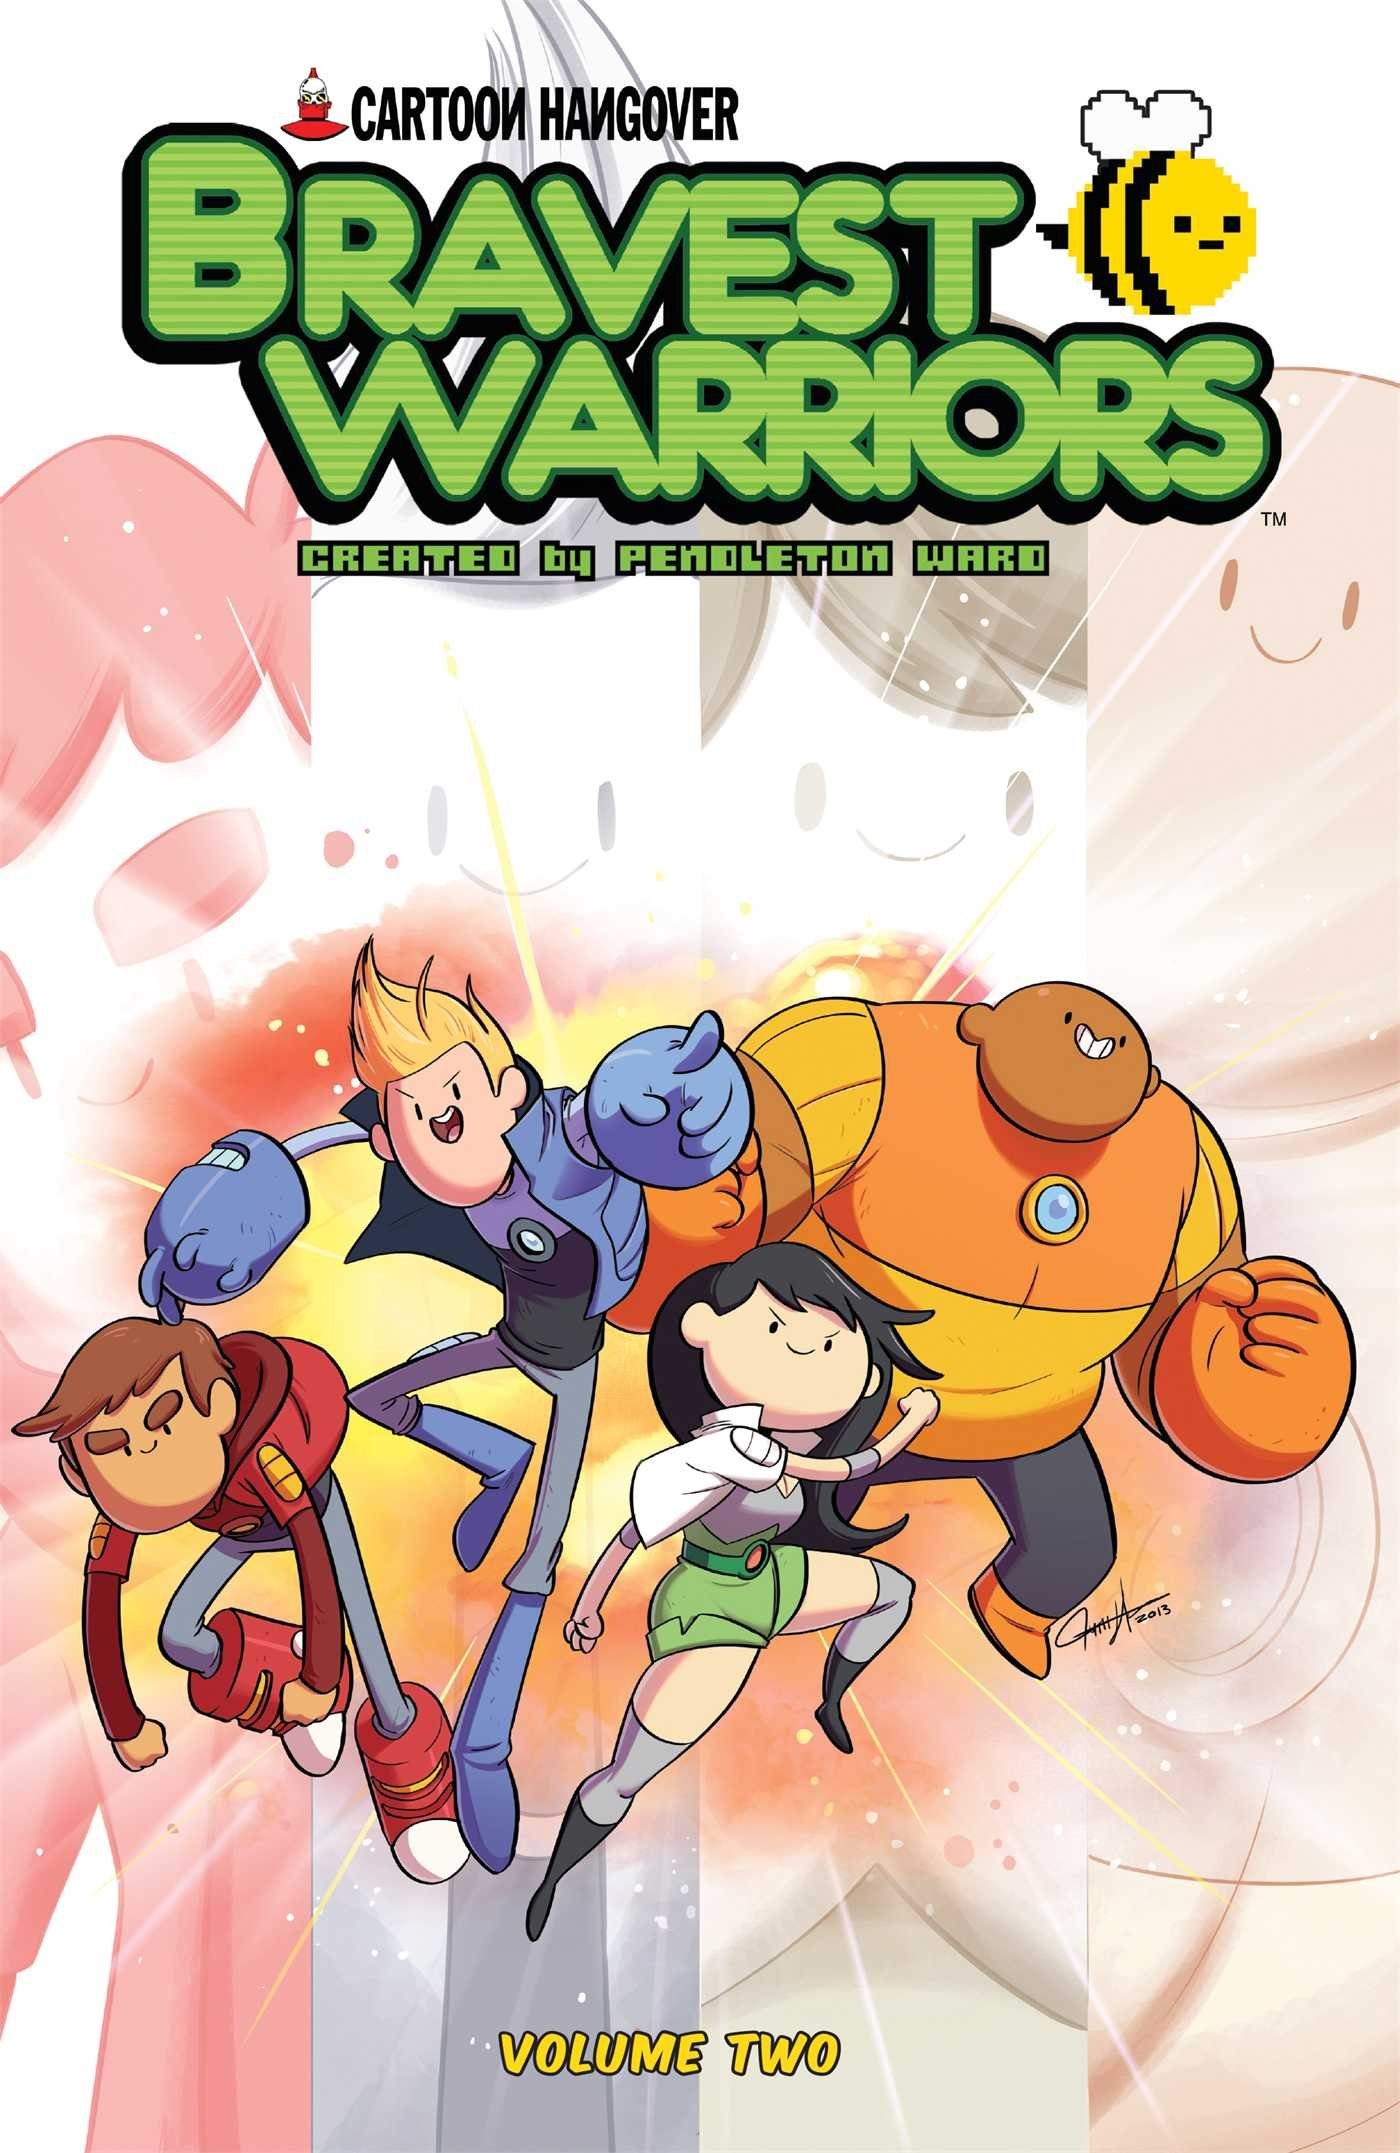 Amazon: Bravest Warriors Vol 2 (9781608863525): Joeyeau, Mike  Holmes: Books